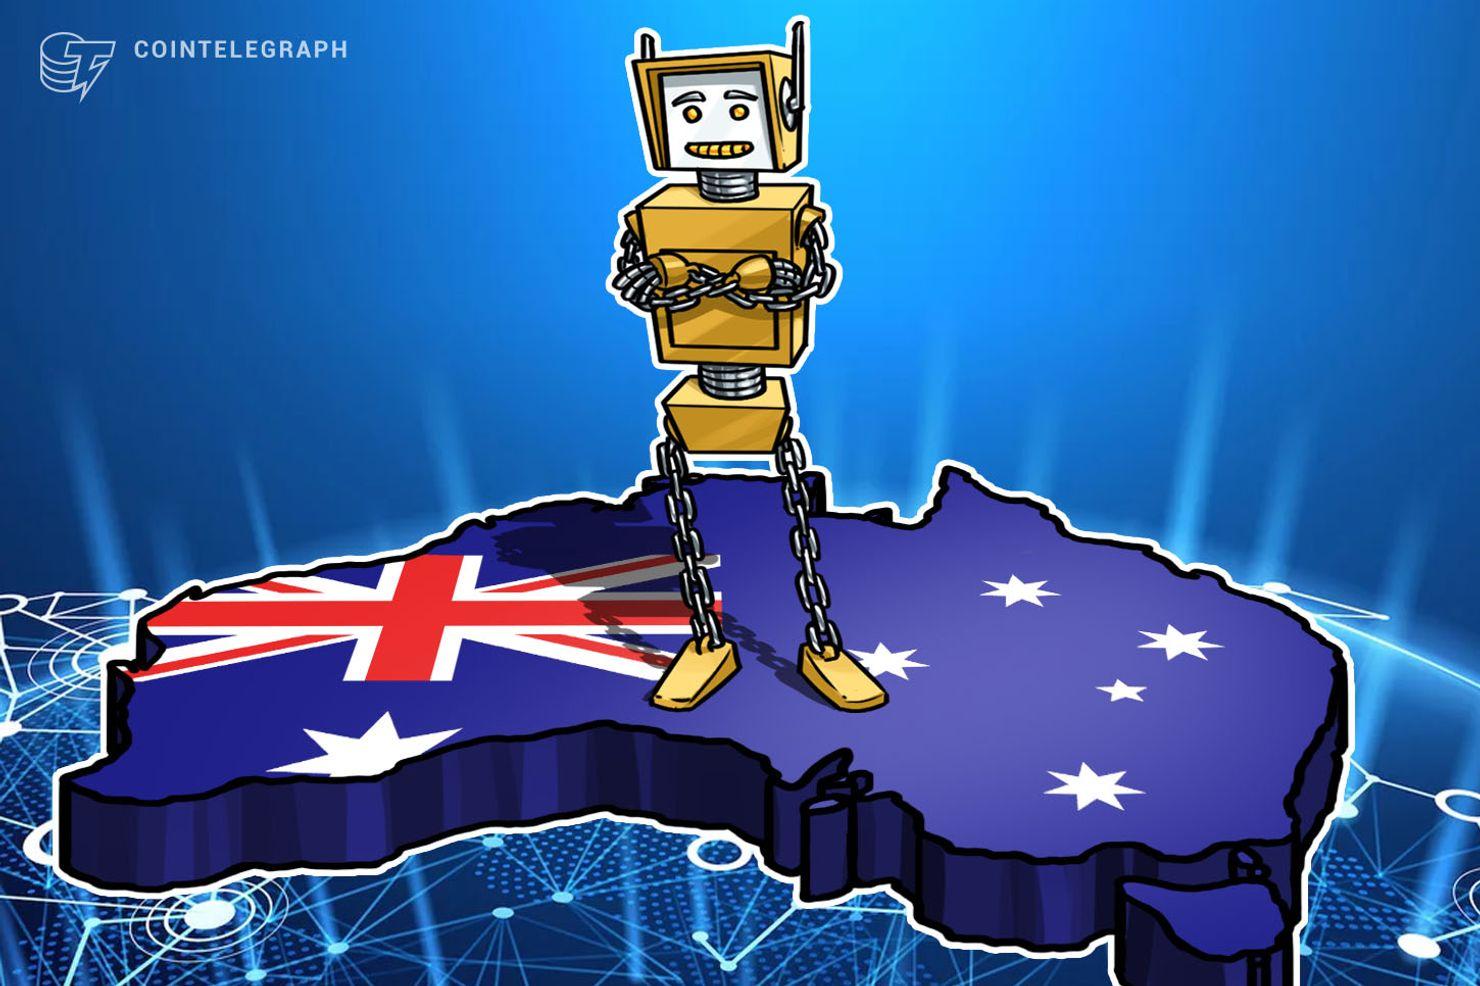 World Bank Mandates Commonwealth Bank of Australia to Issue Bond Using Blockchain Tech